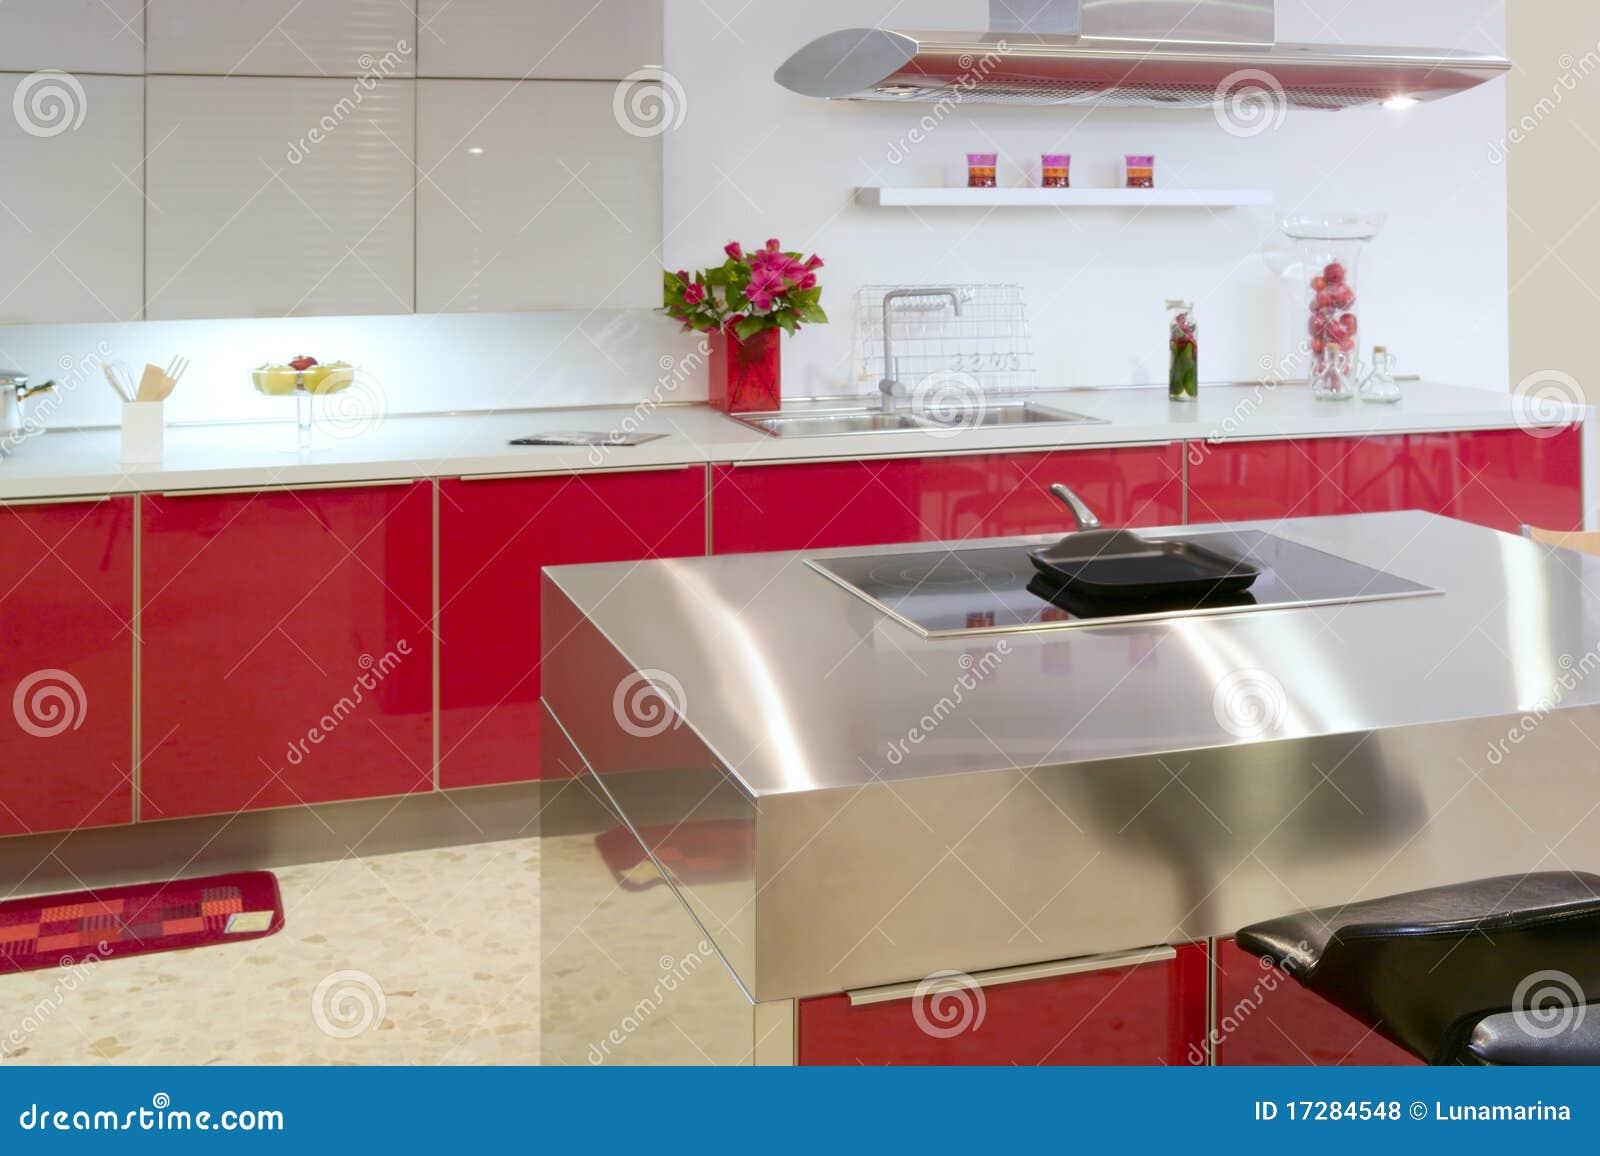 Casas De Decoracion La Plata ~ casa interior moderna de la isla de la plata roja de la cocina